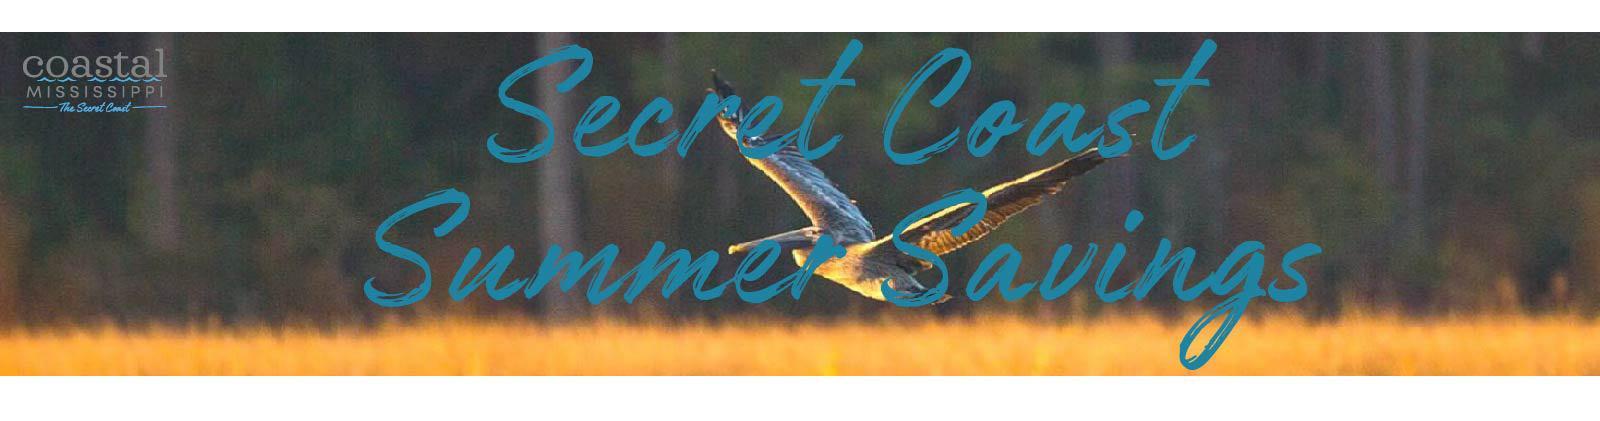 Secret Coast Summer Savings